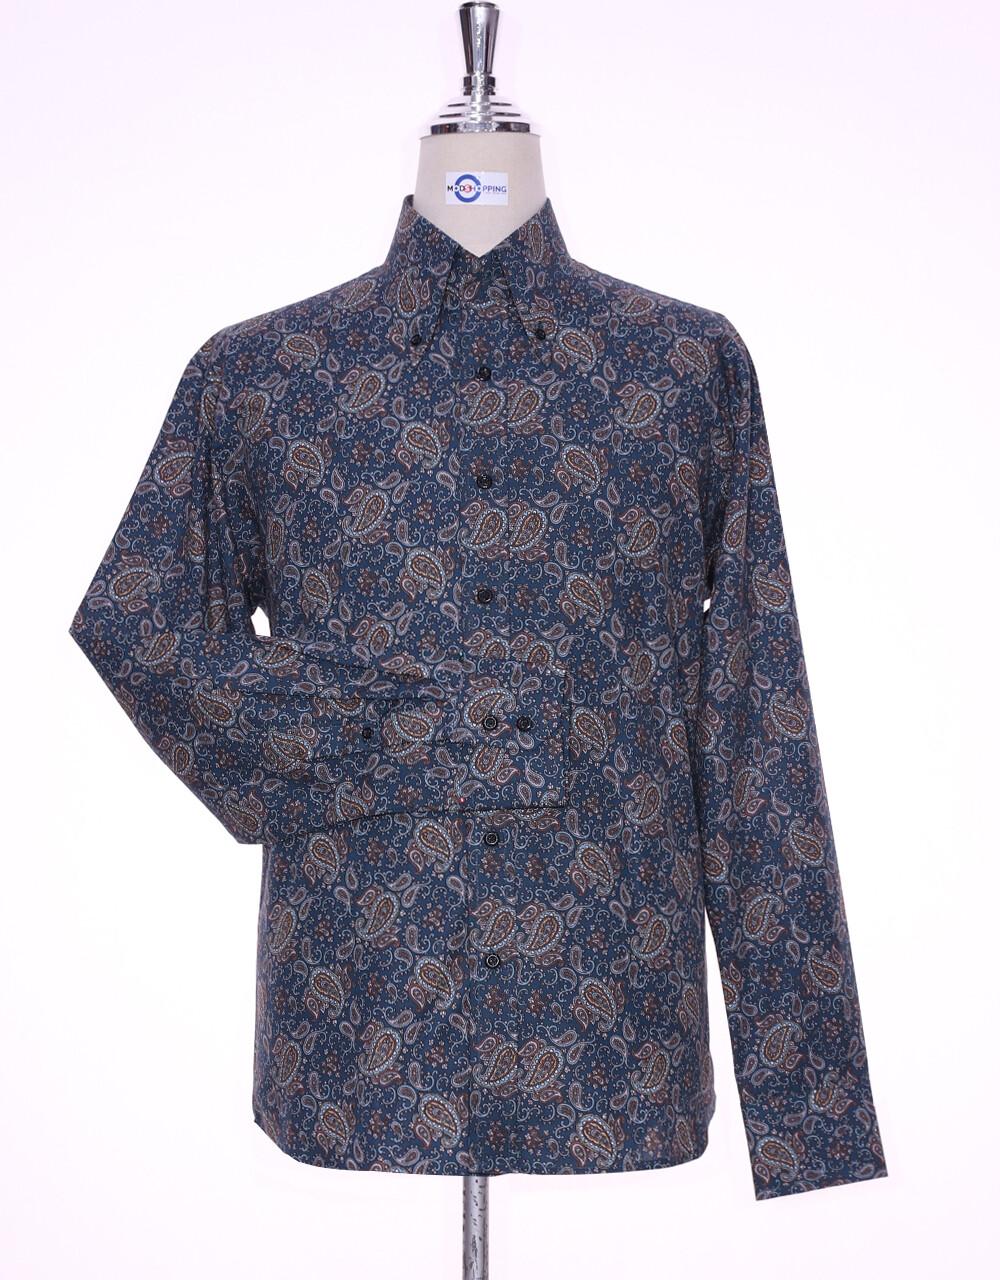 Paisley Shirt   60s Style Multi Color Paisley Men Shirt